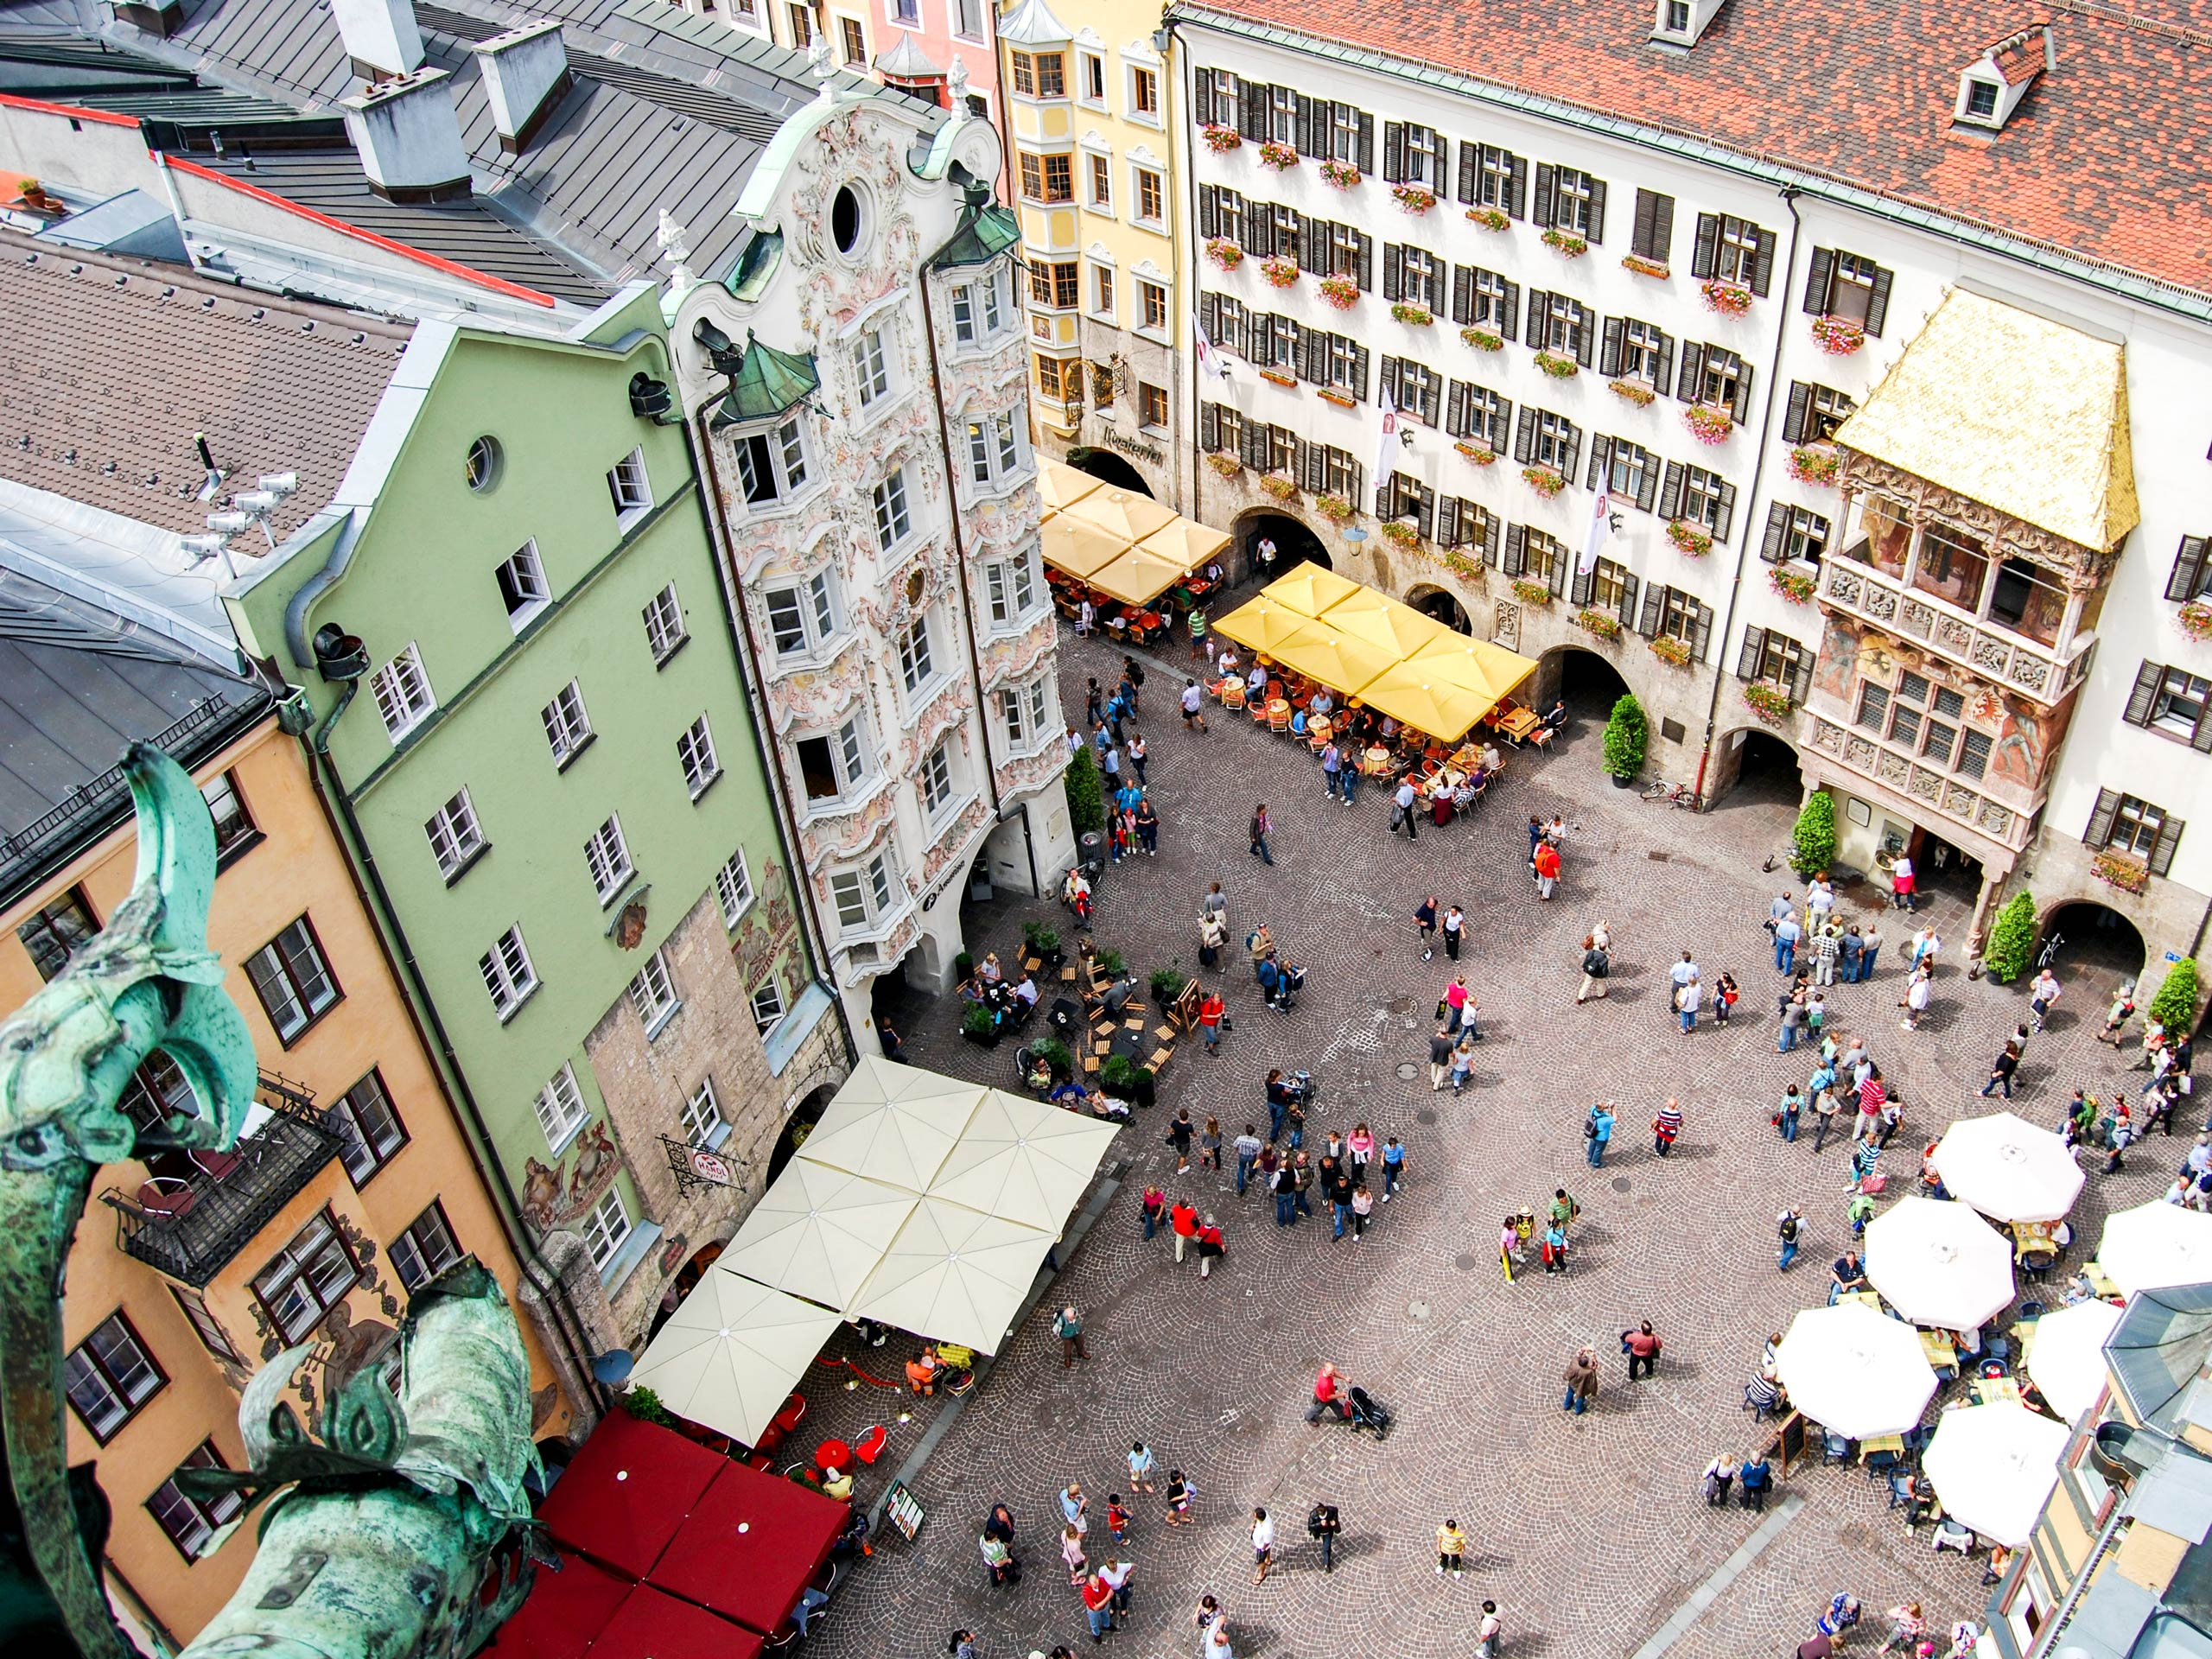 Innsbruck Squaere view